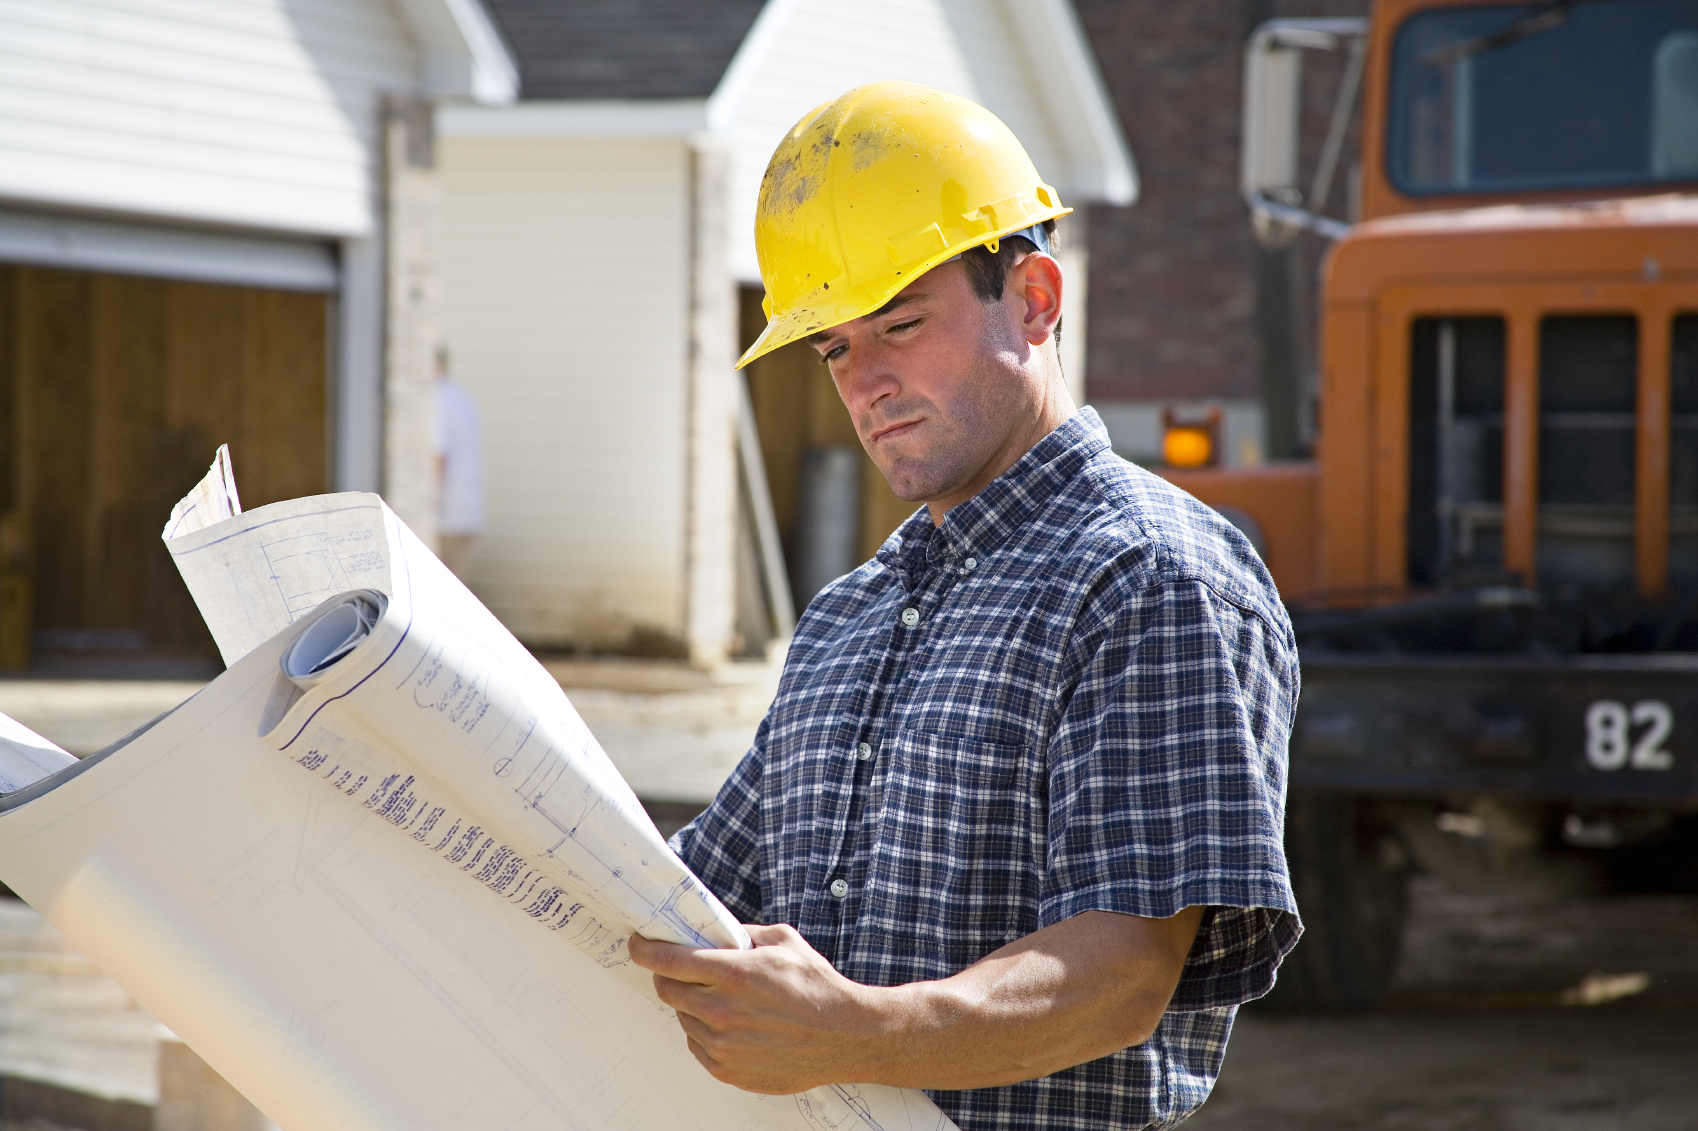 william rutledge construction engineer - HD1698×1131